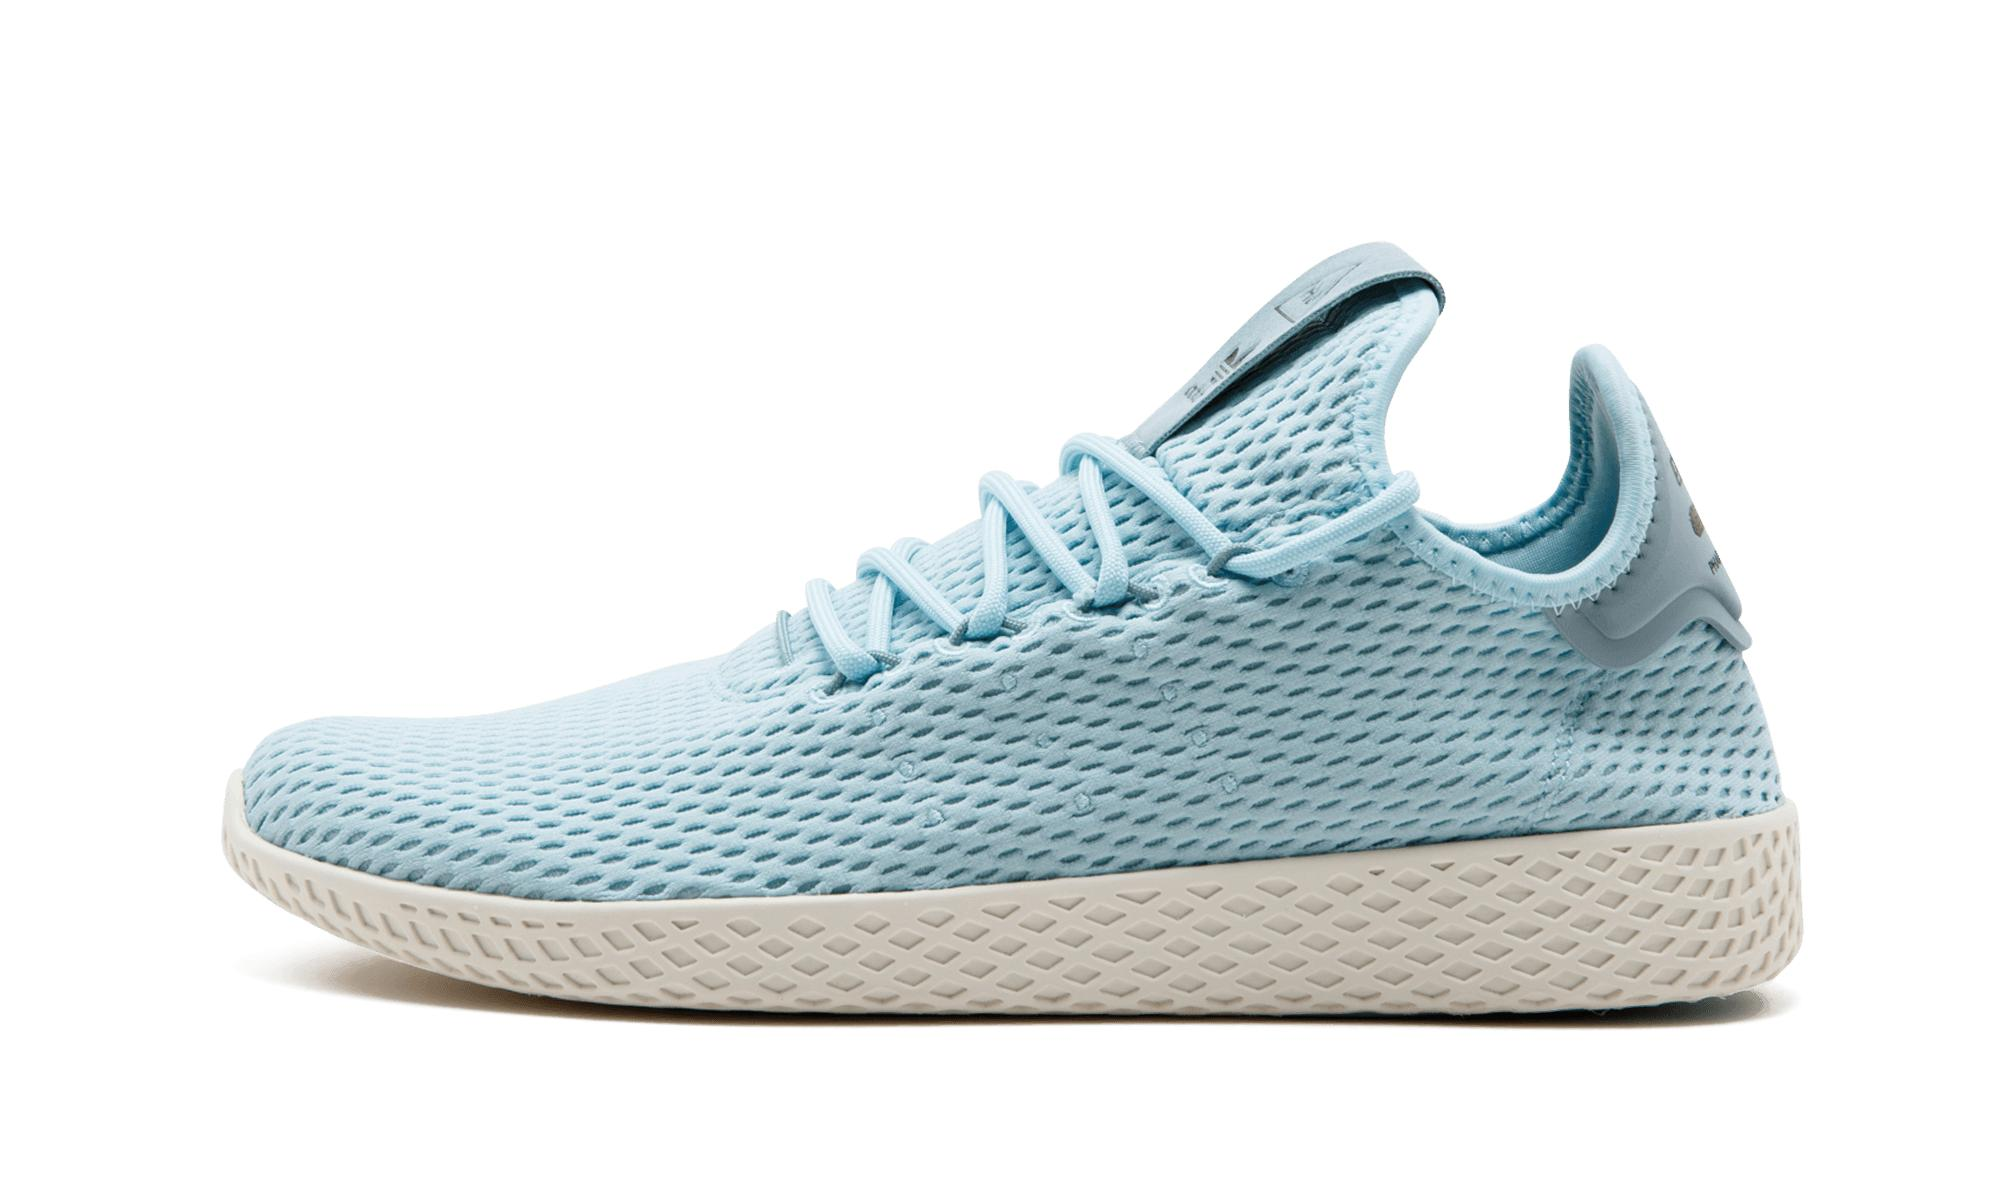 43c3f7480 adidas Pharrell Williams Tennis Hu in Blue for Men - Save 71% - Lyst